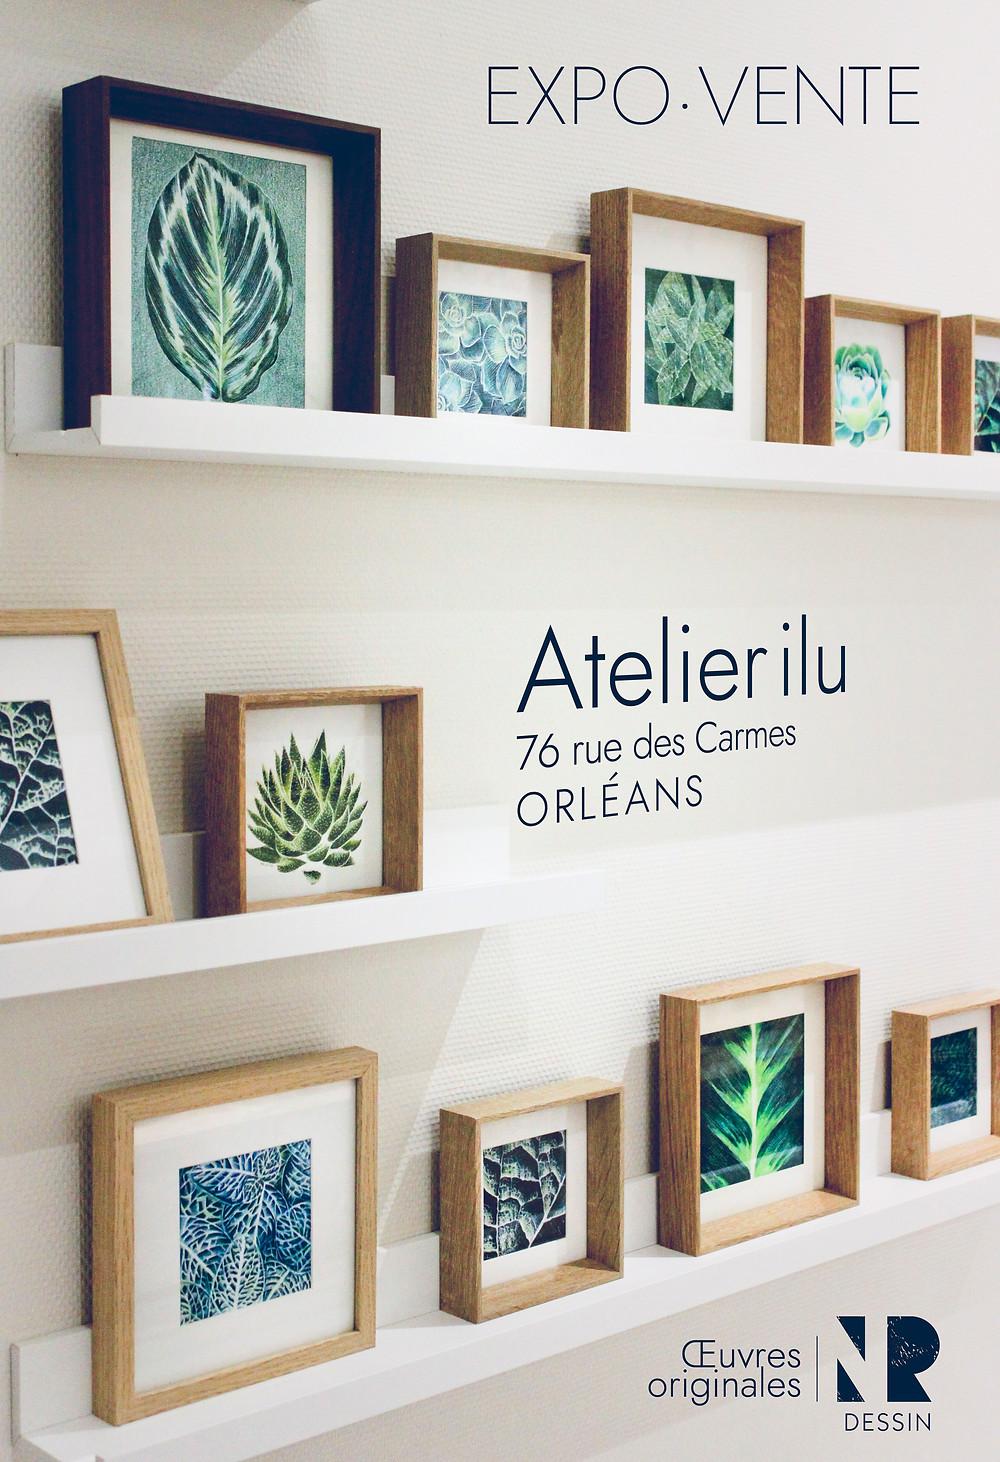 Expo vente | Atelier ilu | NR Dessin | 2019